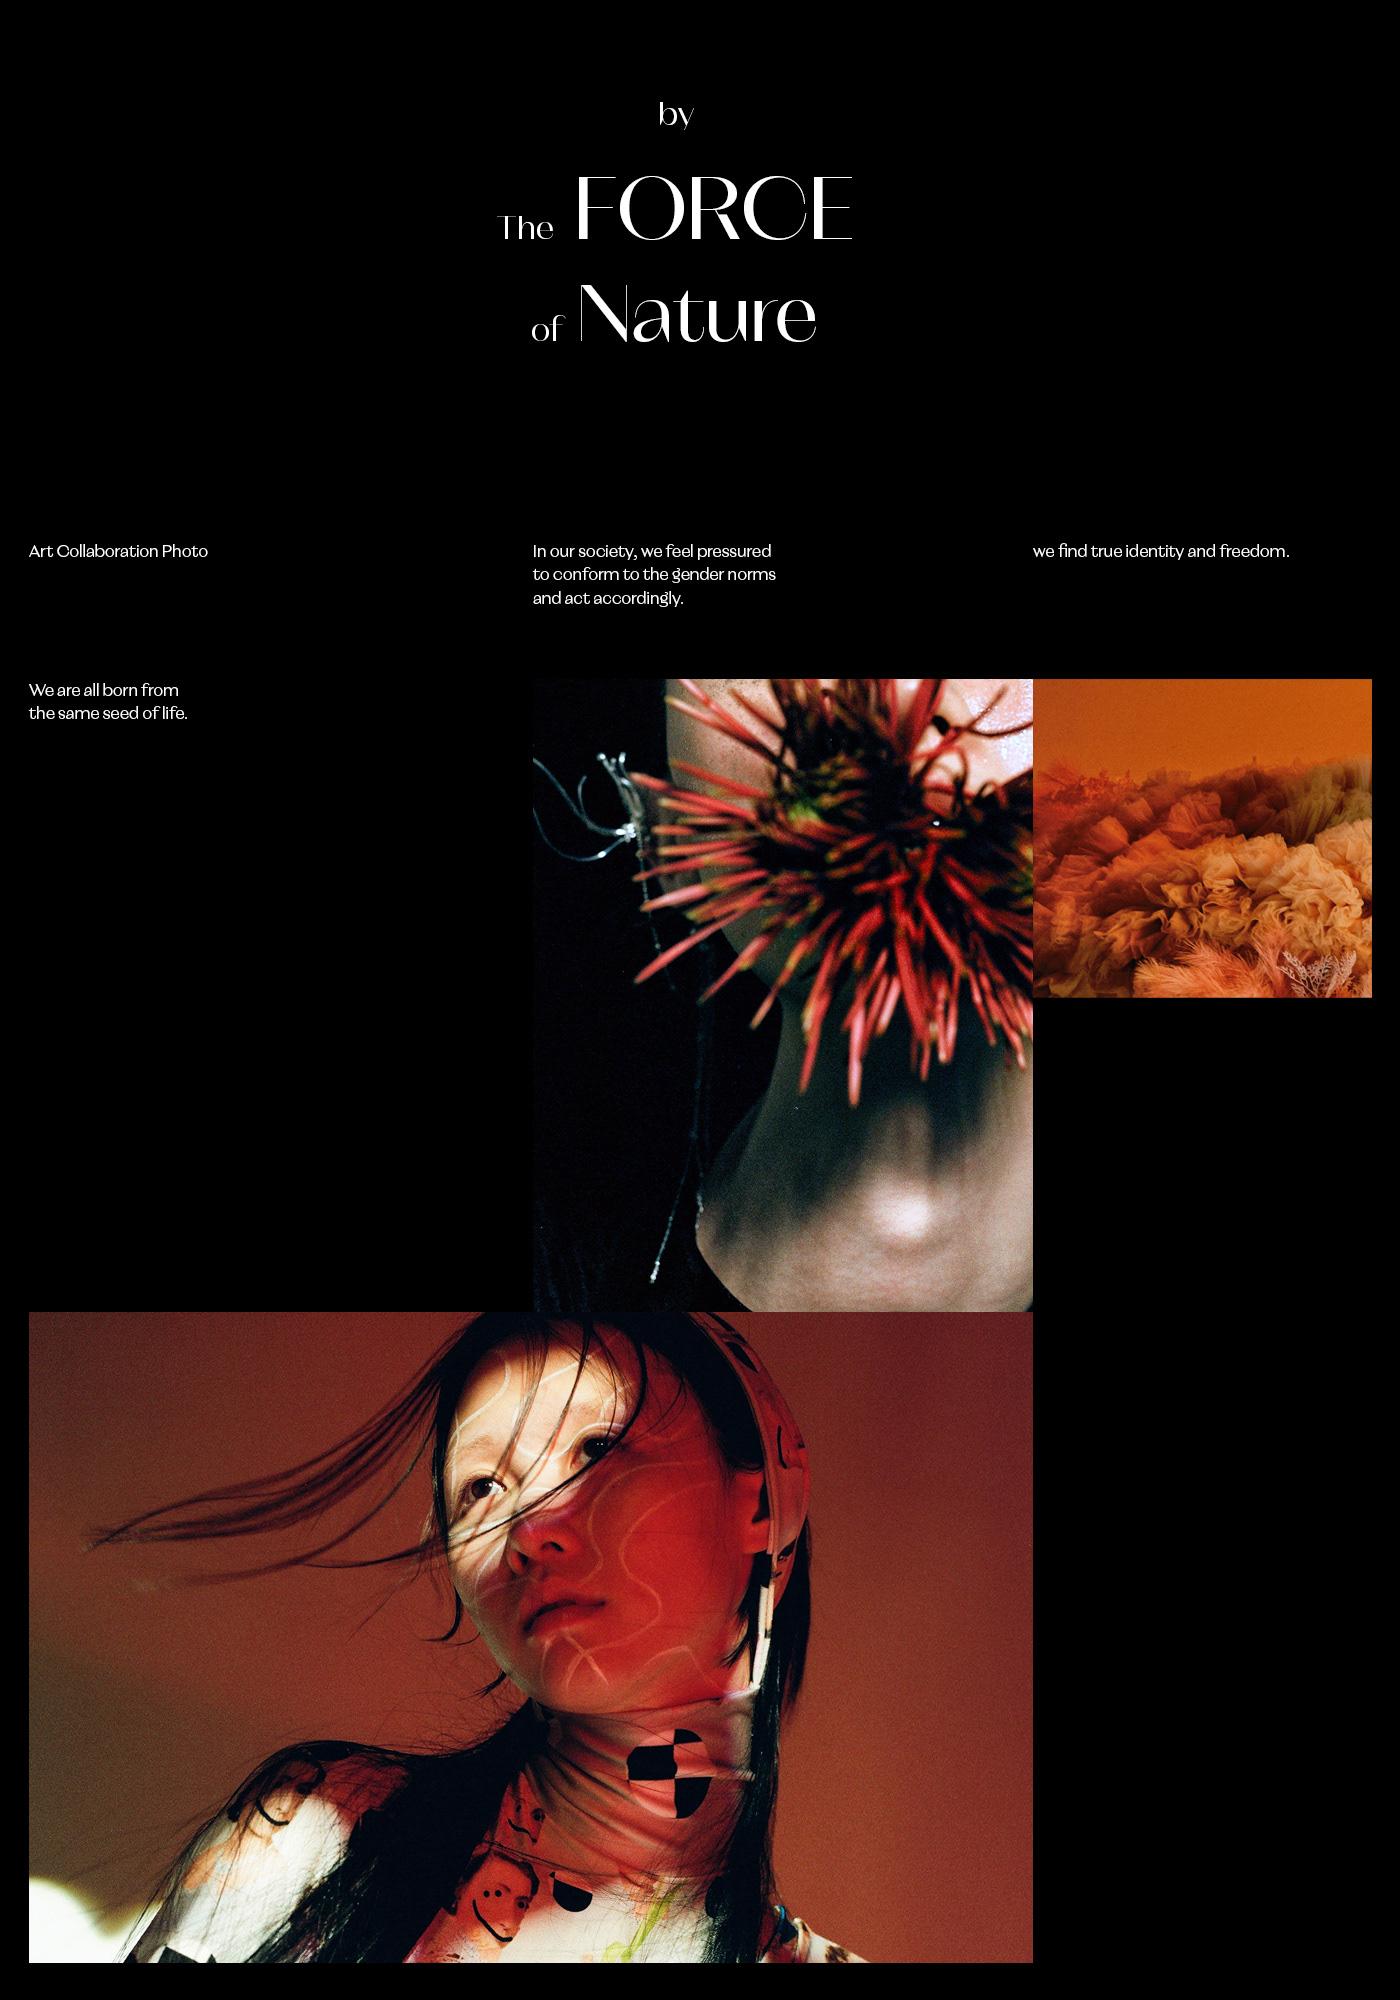 art brand identity branding  Exhibition  Fashion  Film   graphic identity Media Art poster